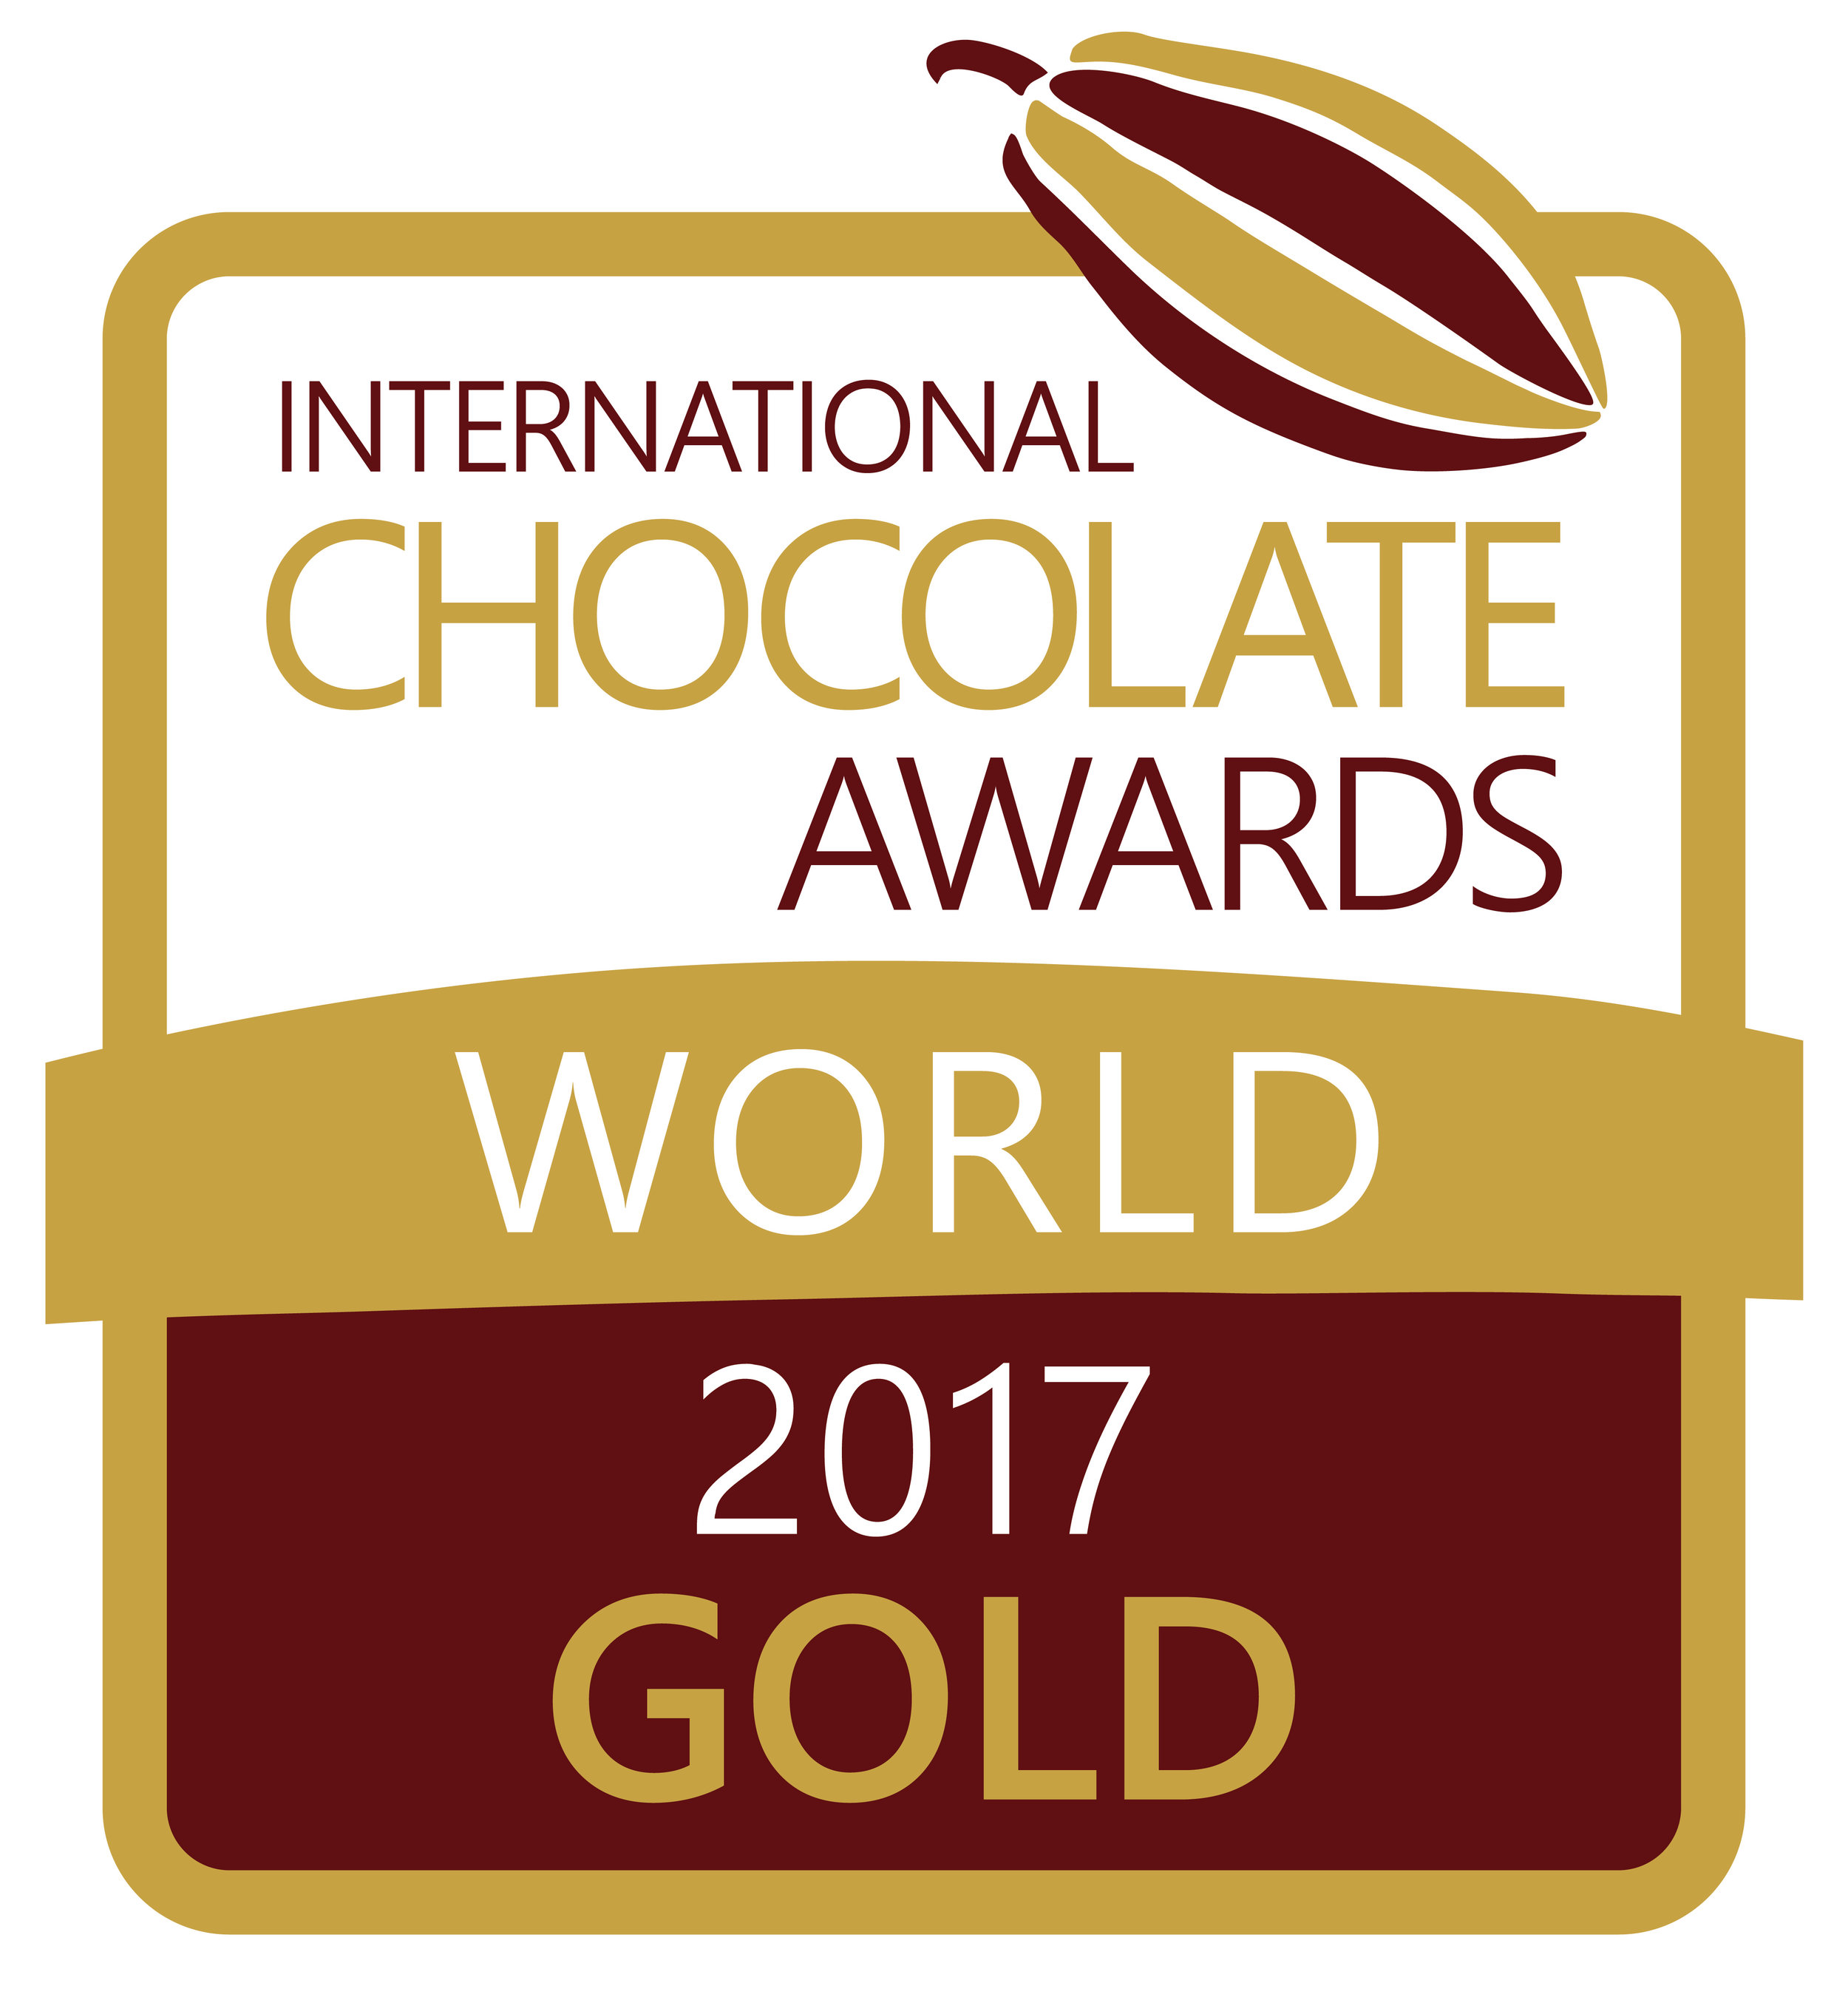 International Chocolate Awards Gold 2017